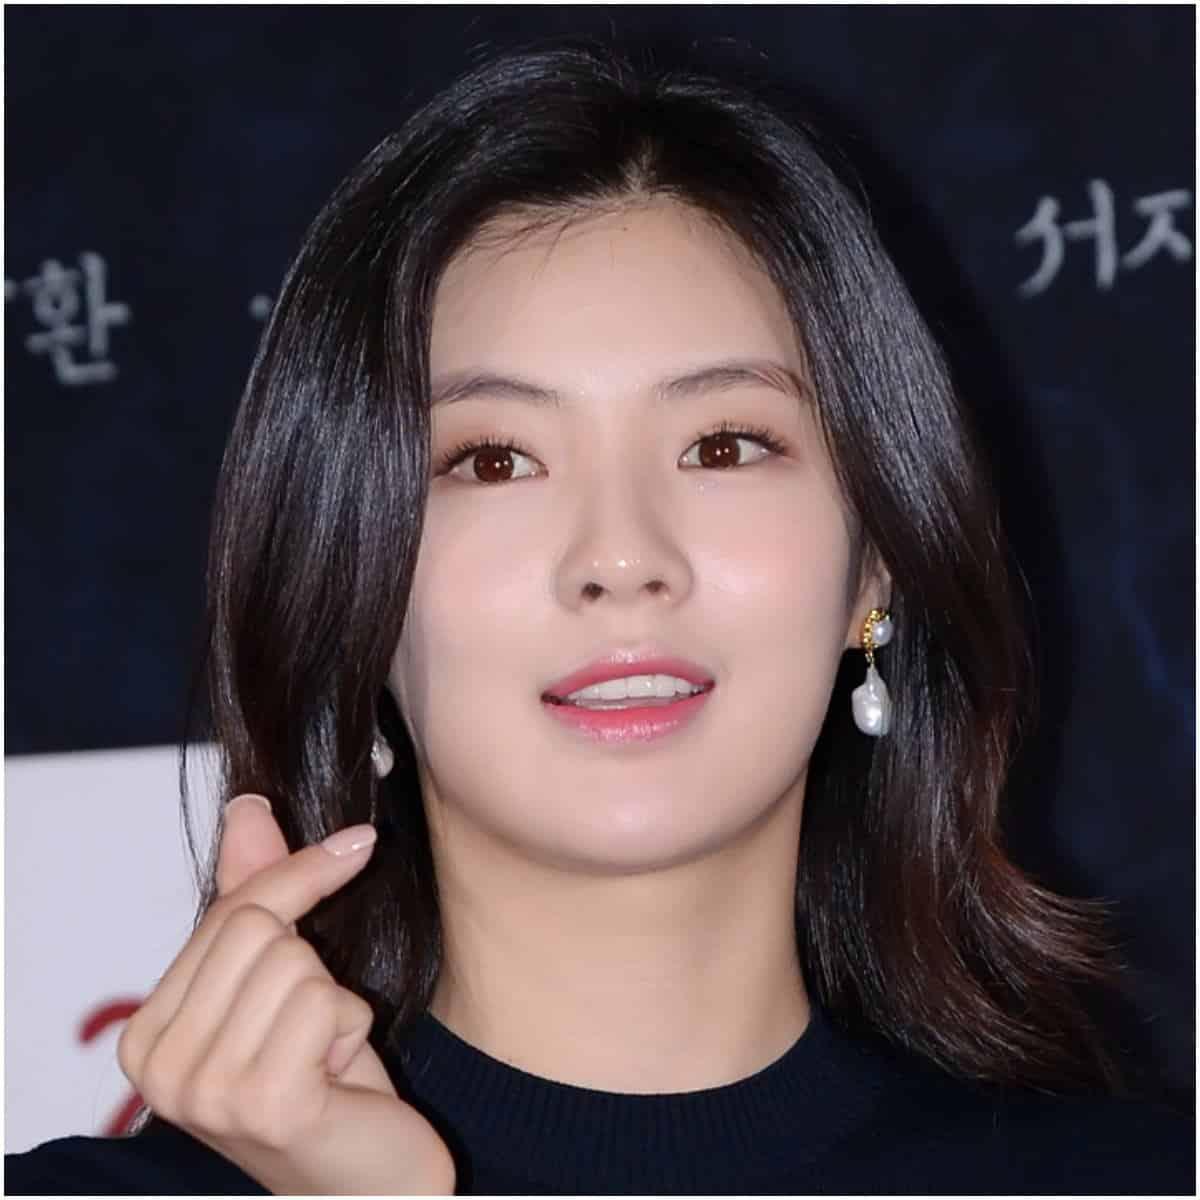 Lee Sun-bin, girlfriend of Lee Kwang-soo